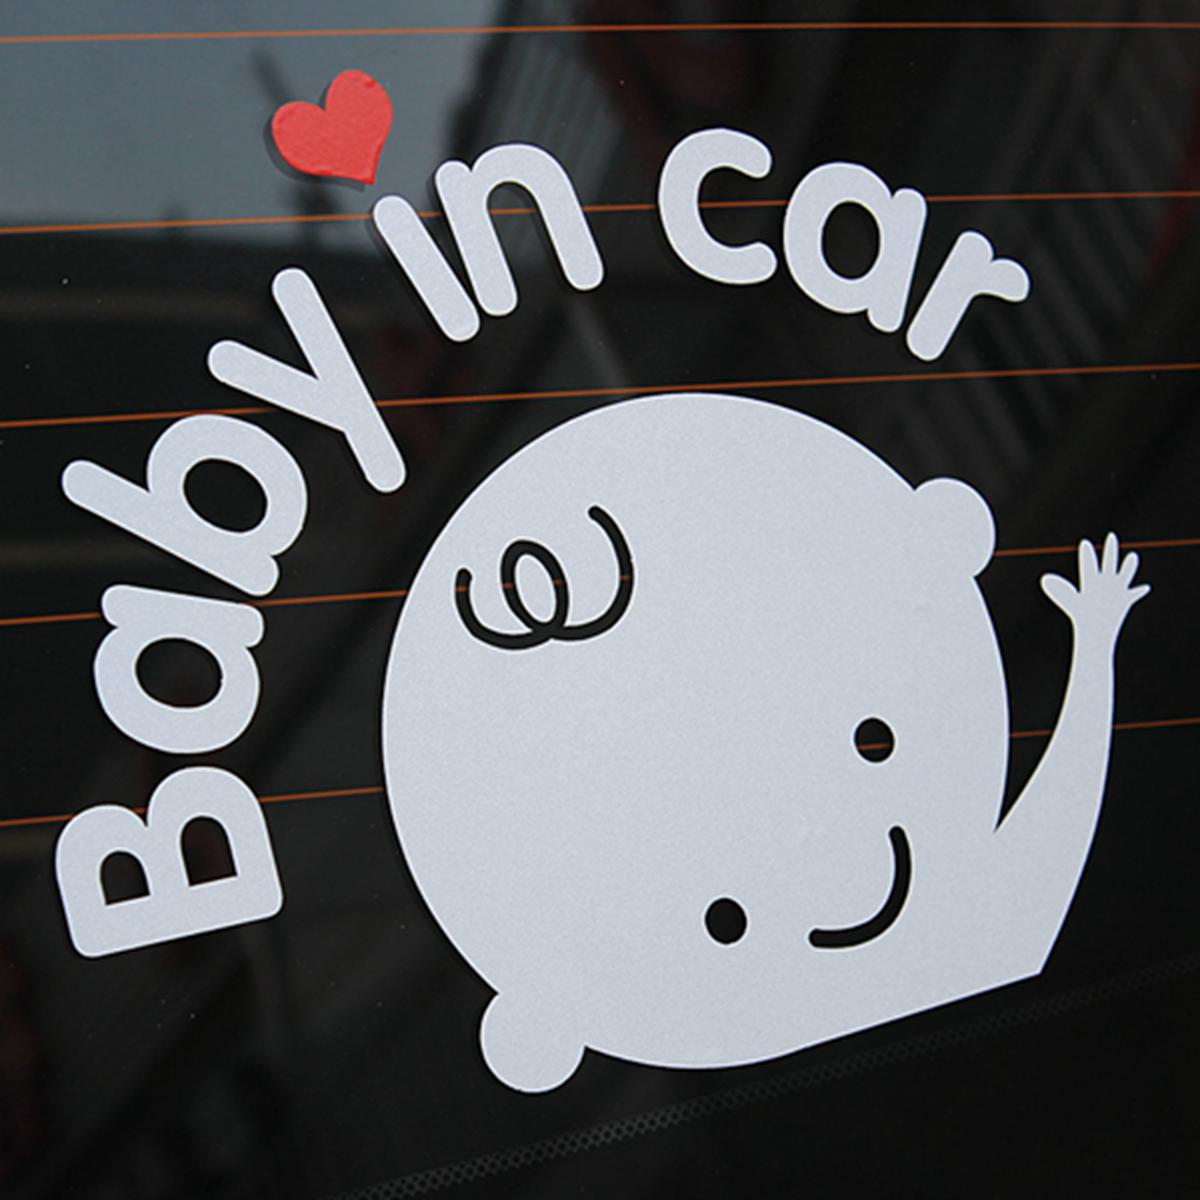 Baby In Car Waving Baby On Board Safety Sign Cute Car Decal Vinyl Sticker Cute Car Decals Car Decals Vinyl Car Window Stickers [ 1200 x 1200 Pixel ]